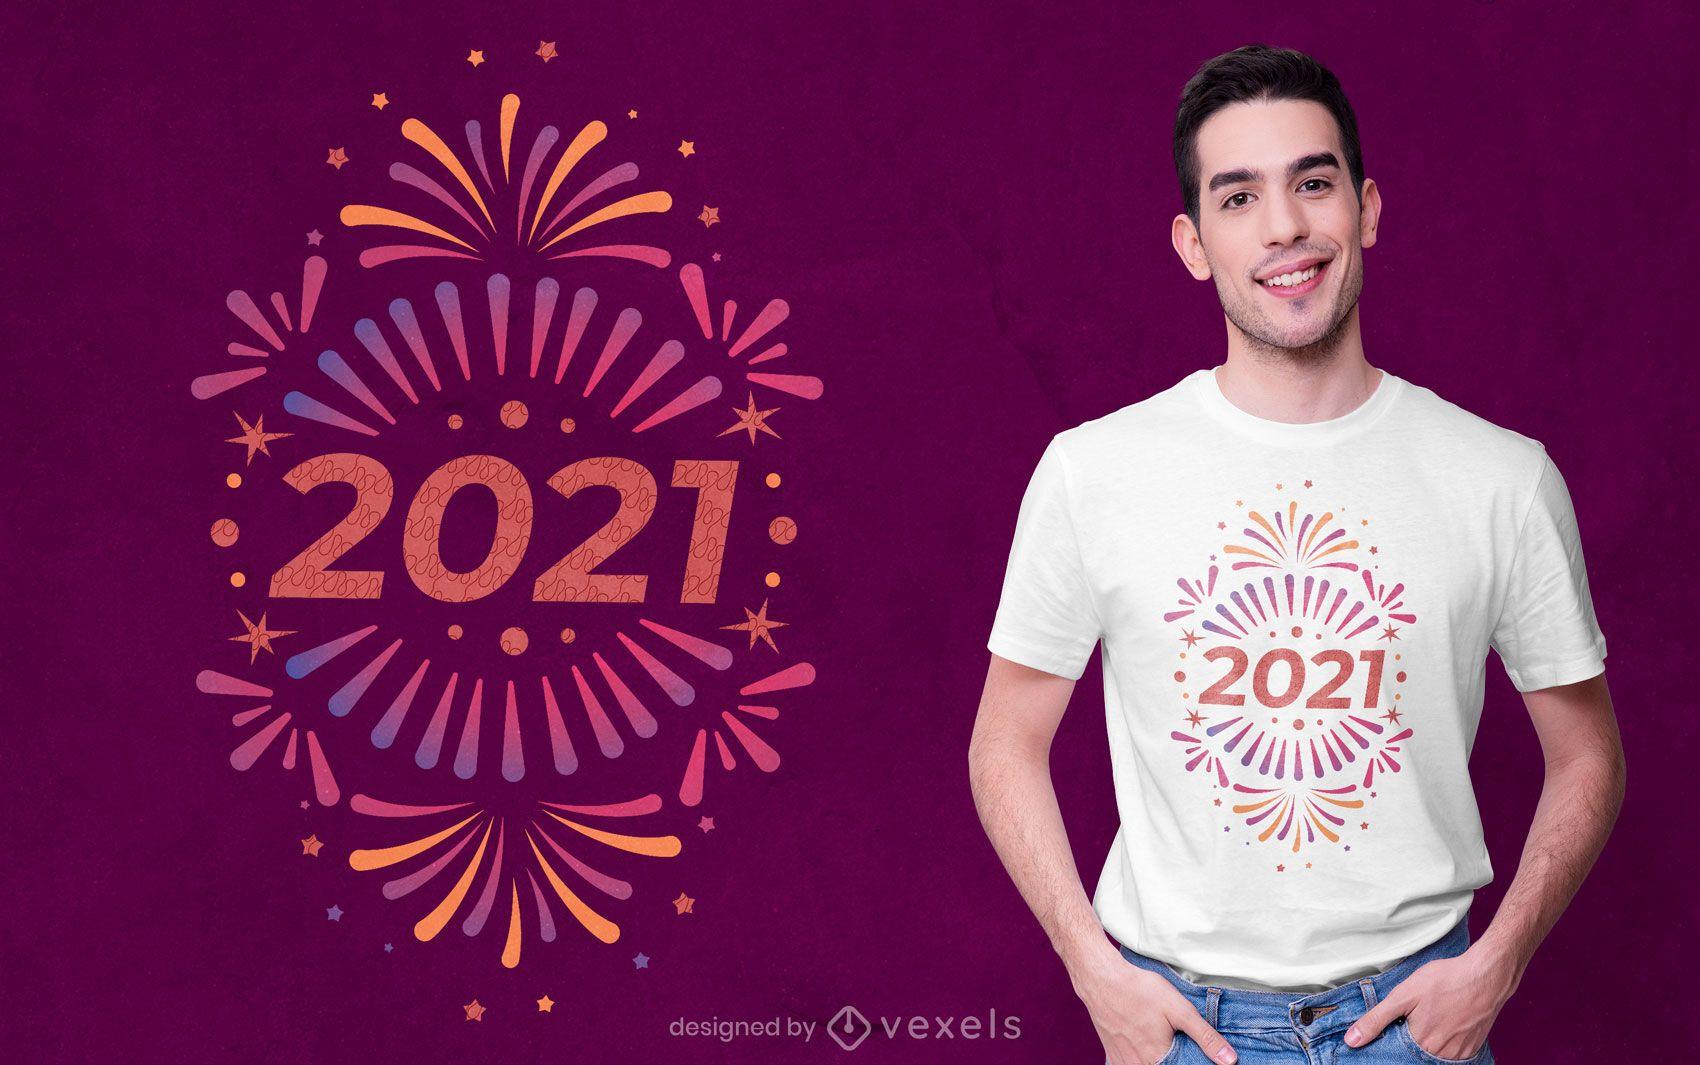 New year 2021 t-shirt design